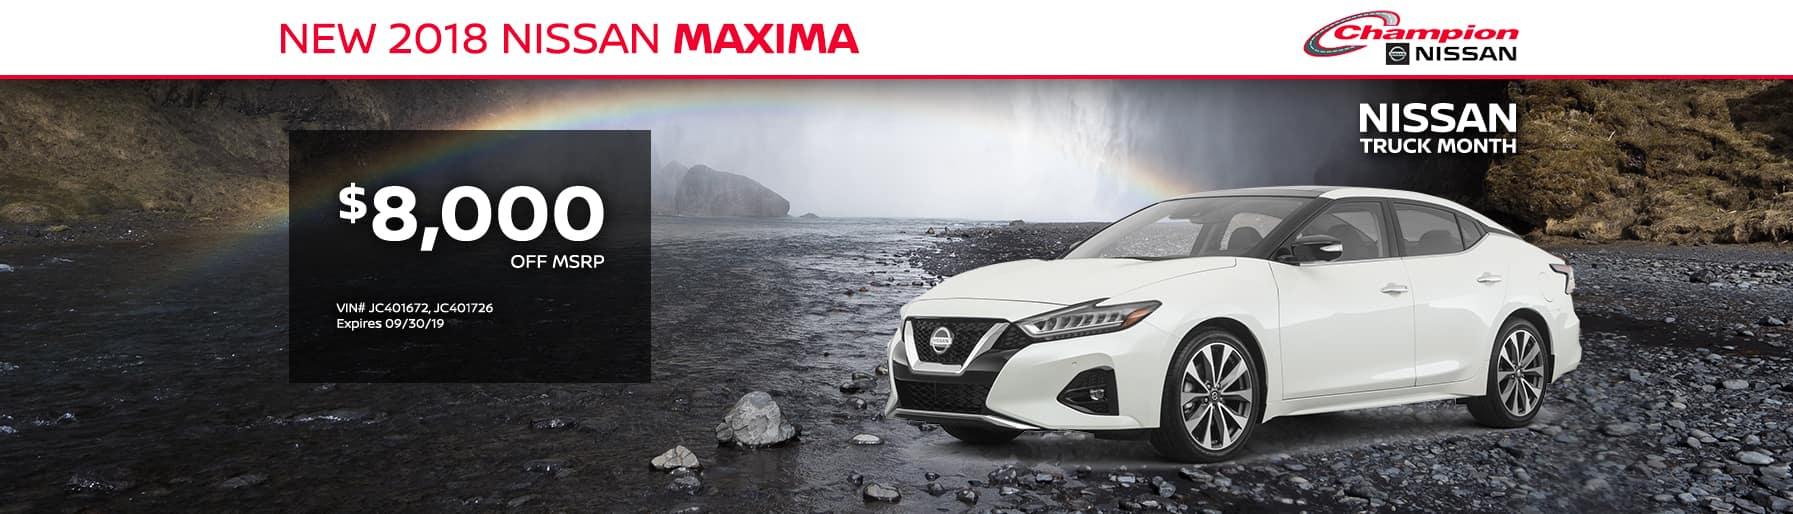 desktop TK 2018 Nissan Maxima